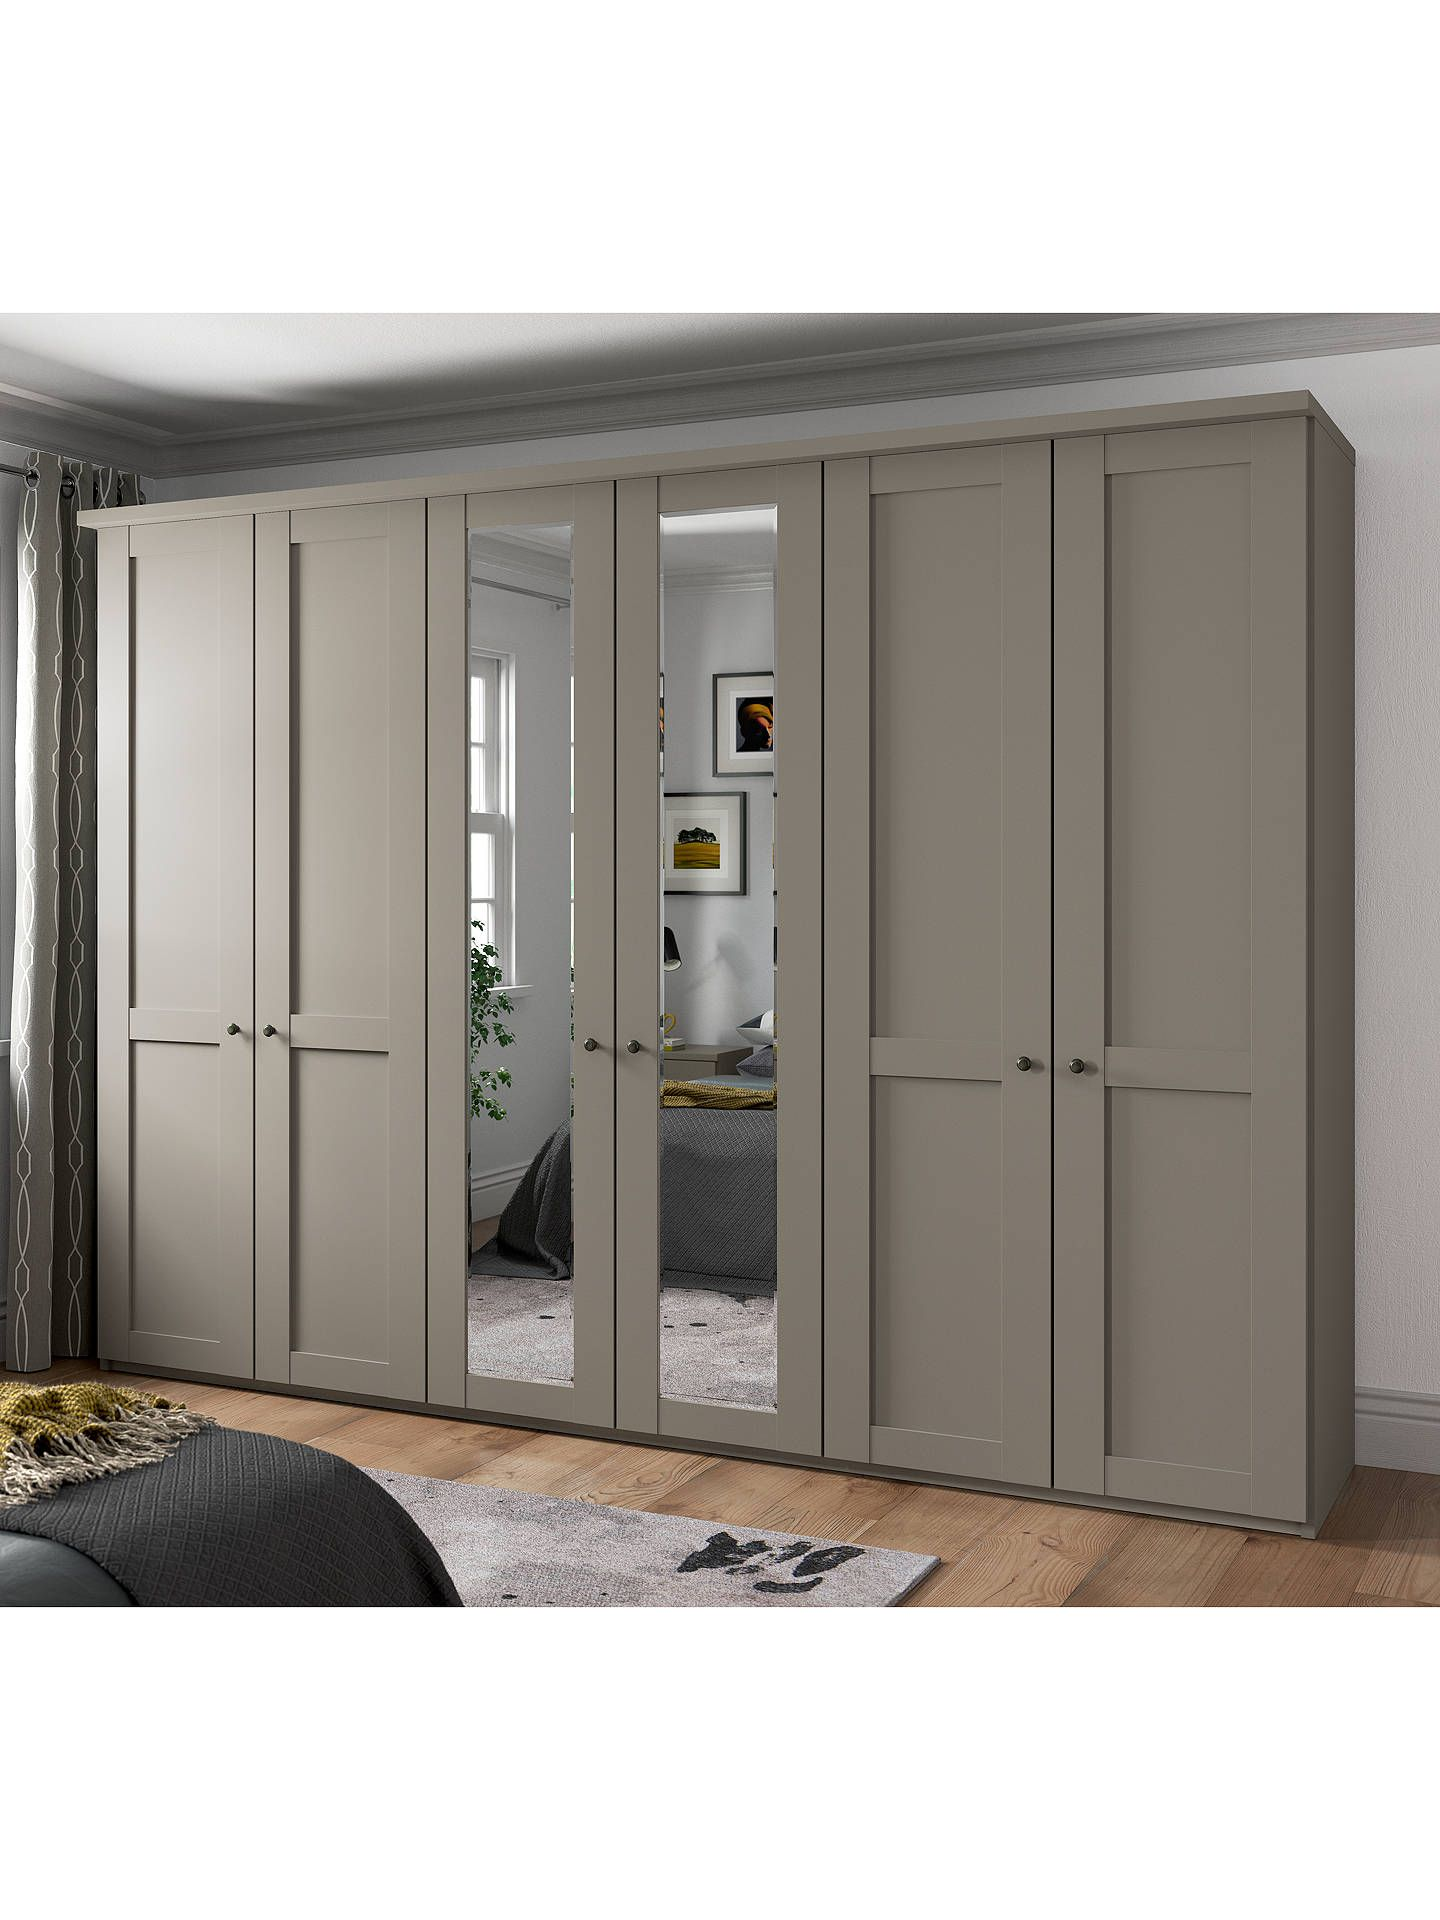 John Lewis & Partners Marlow 300cm Mirrored Hinged Wardrobe, Pebble Grey